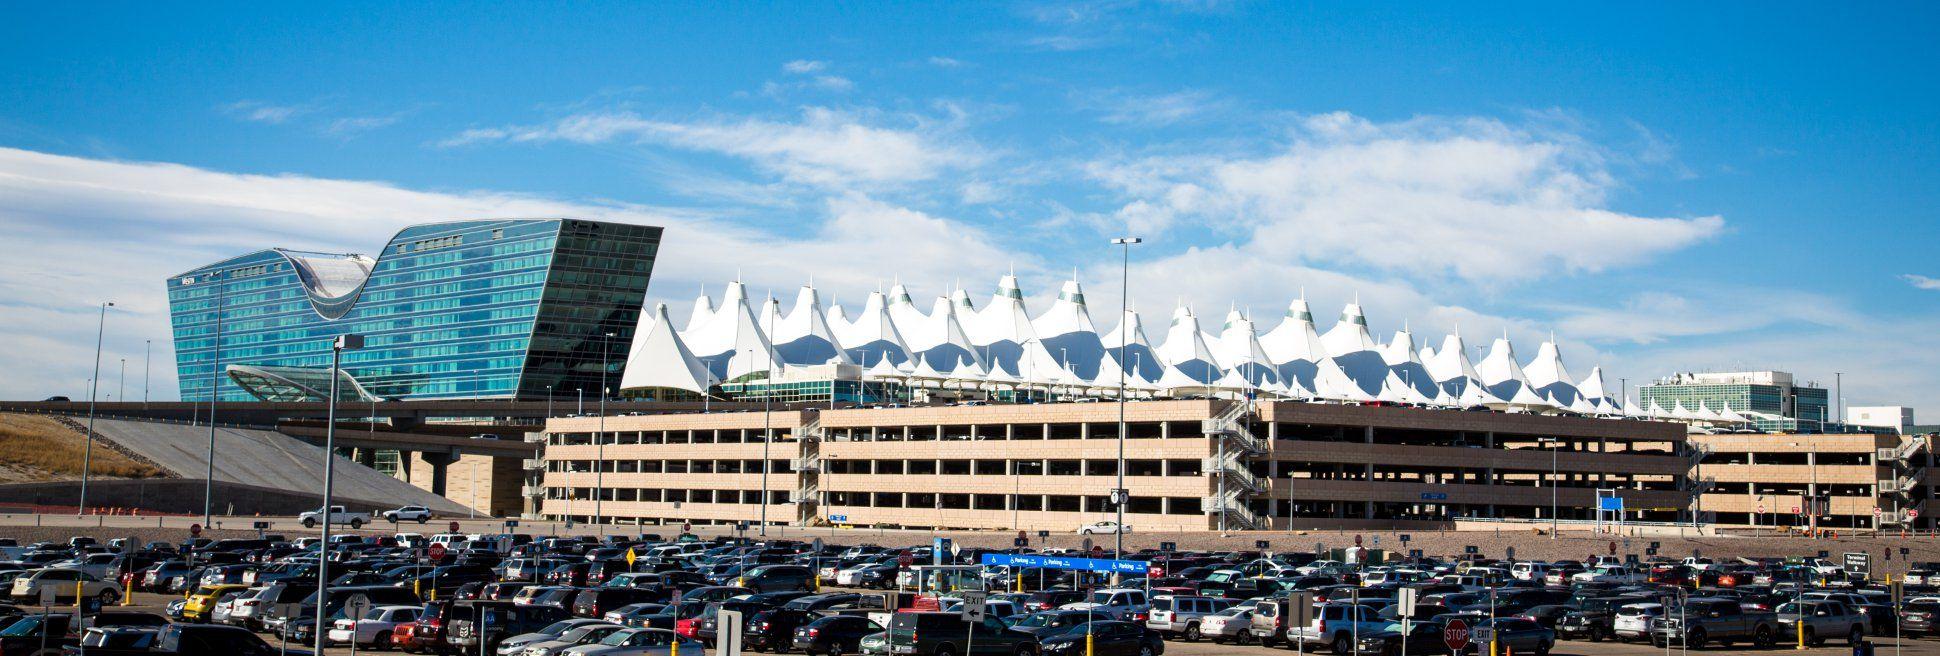 Remember Where I Parked Denver International Airport Denver International Airport Denver Travel Airport Parking